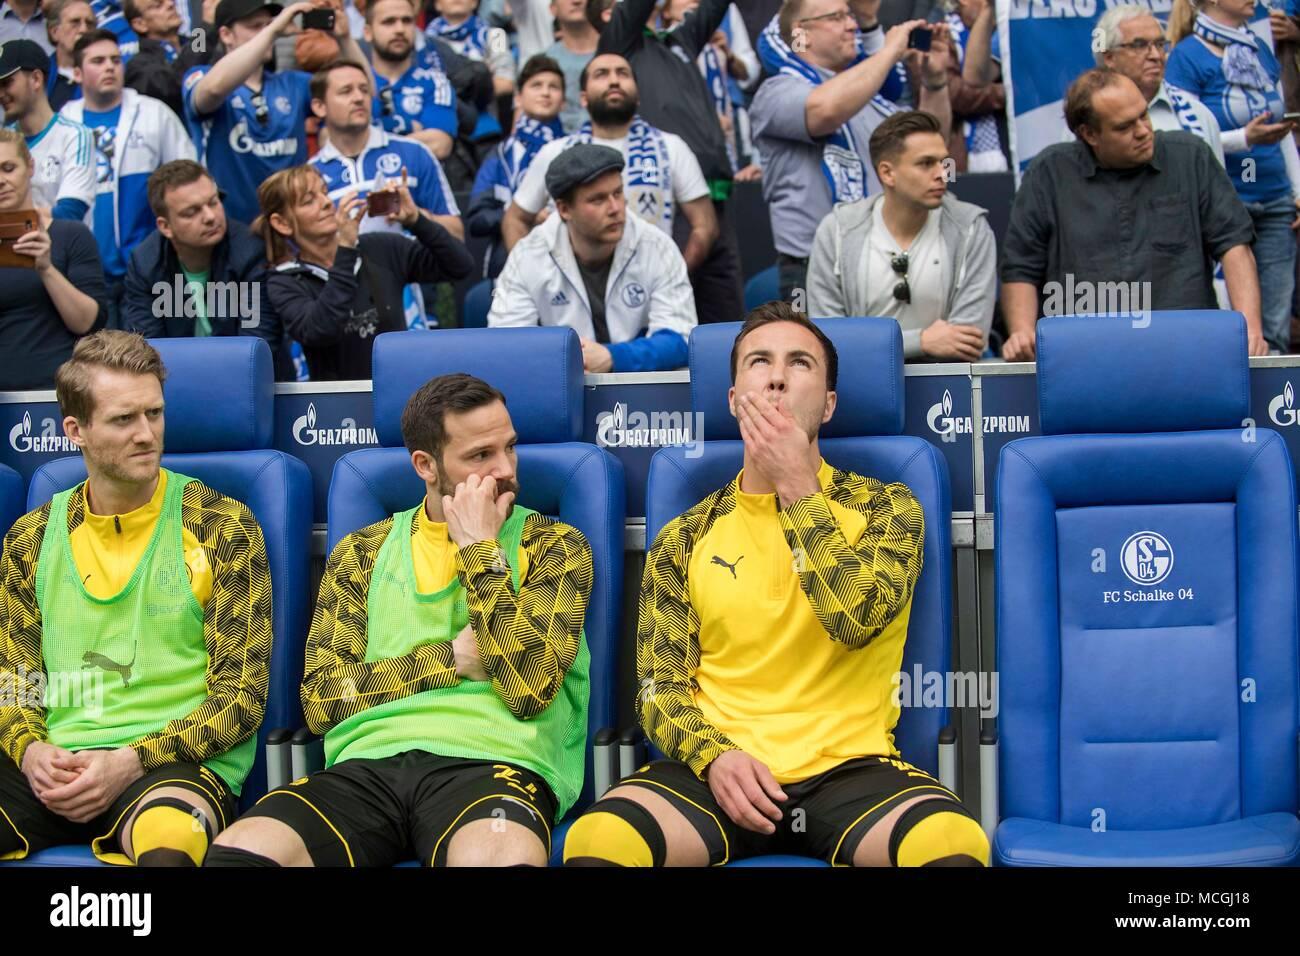 the substitutes of DO, Mario GOETZE (Gotze) (DO), Gonzalo CASTRO (DO), Andre SCHUERRLE (Schurrle) (DO), Soccer 1. Bundesliga, 30. matchday, FC Schalke 04 (GE) - Borussia Dortmund (DO ), on 15.04.2018 in Gelsenkirchen/Germany. | usage worldwide - Stock Image